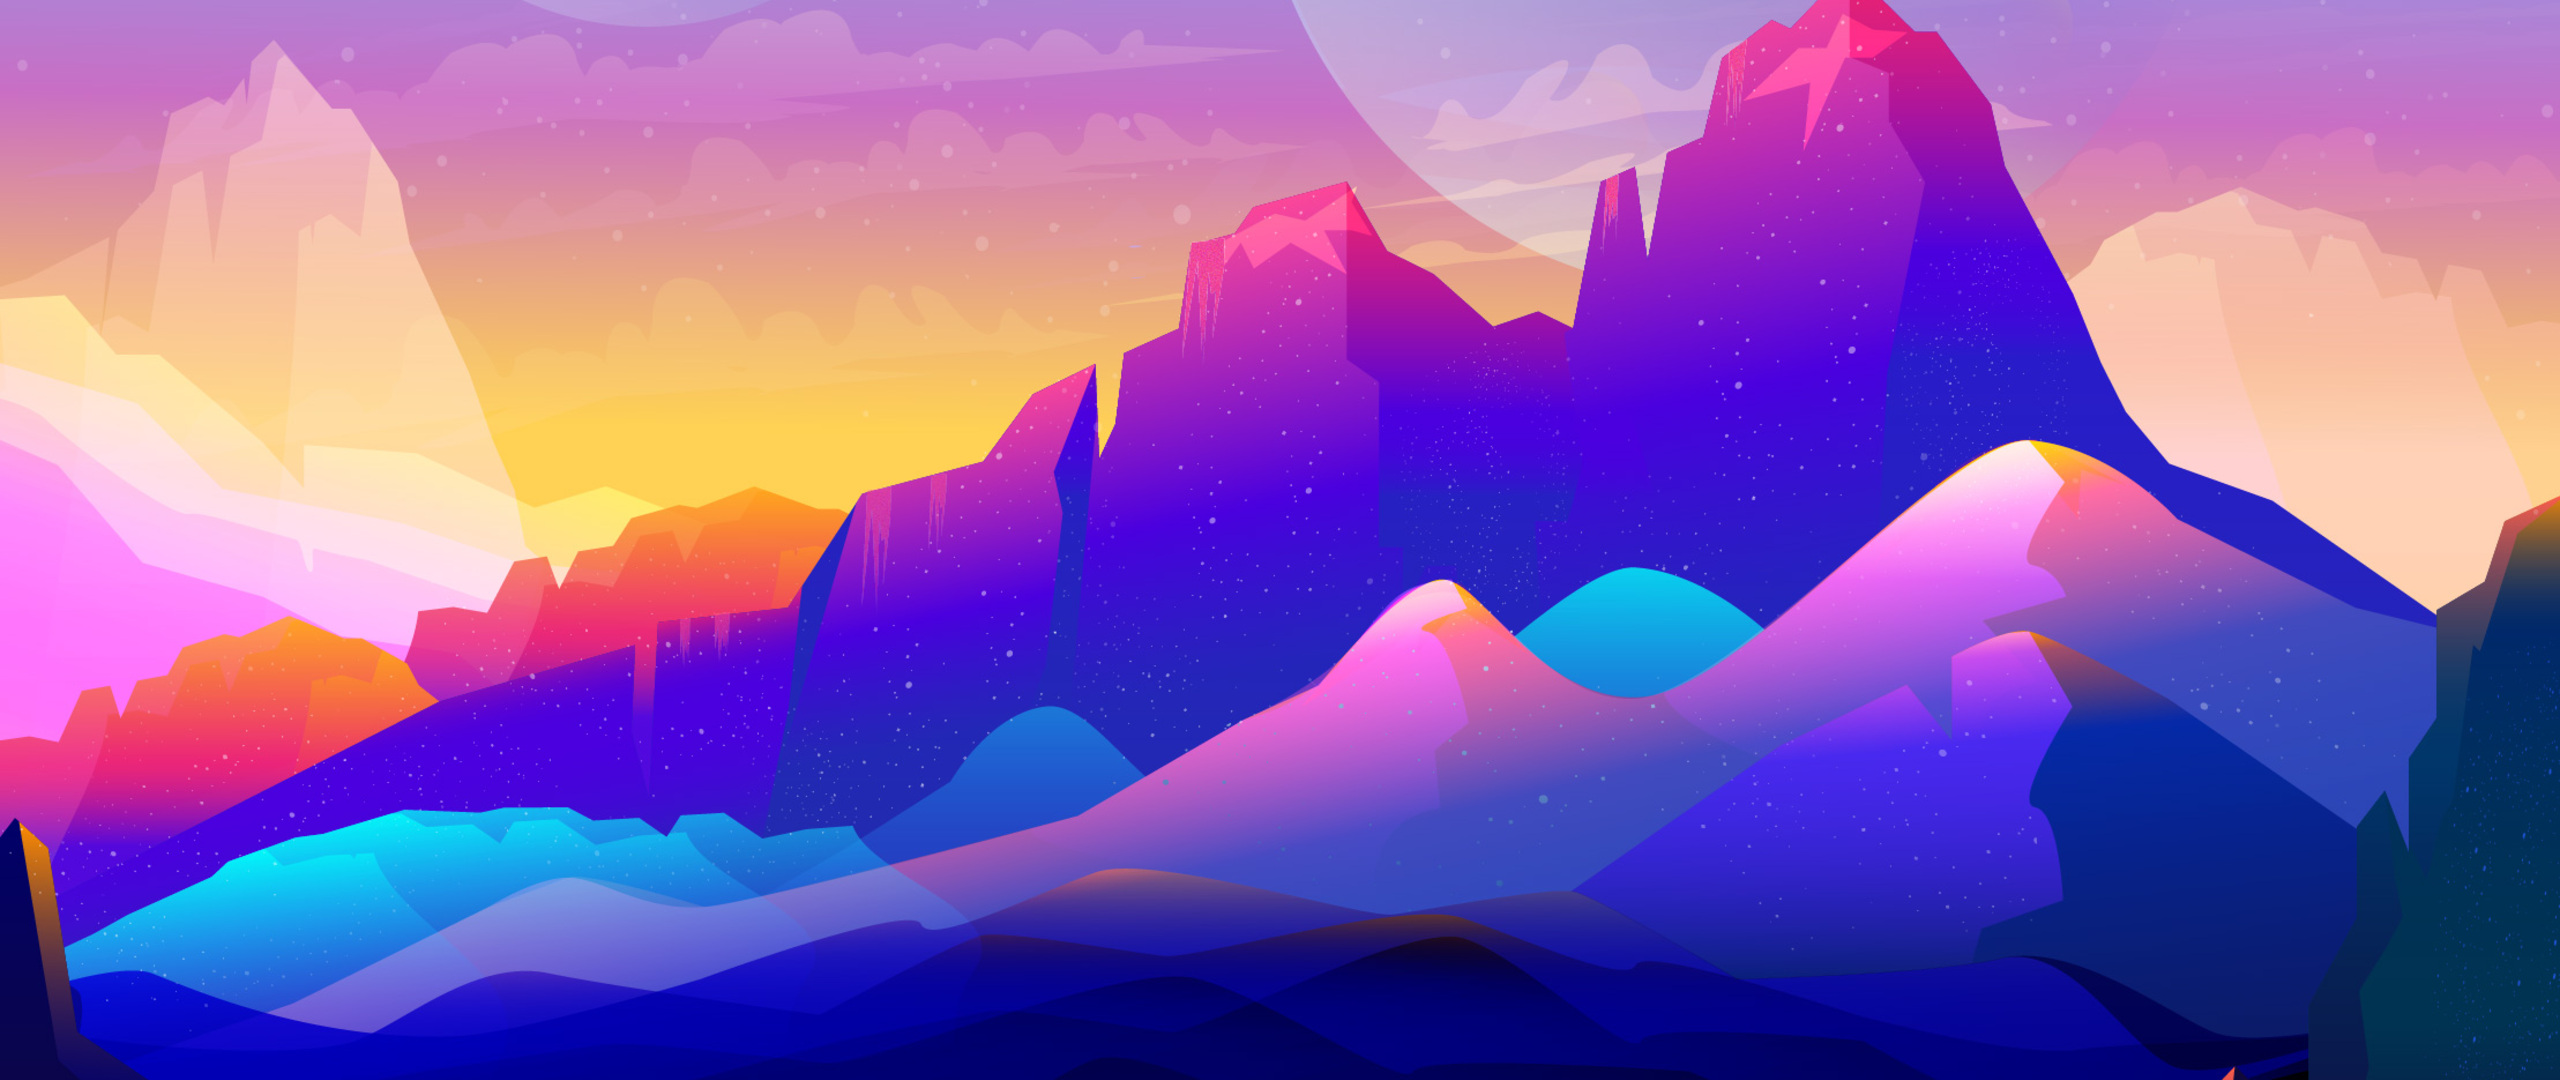 rock-mountains-landscape-colorful-illustration-minimalist-rz.jpg